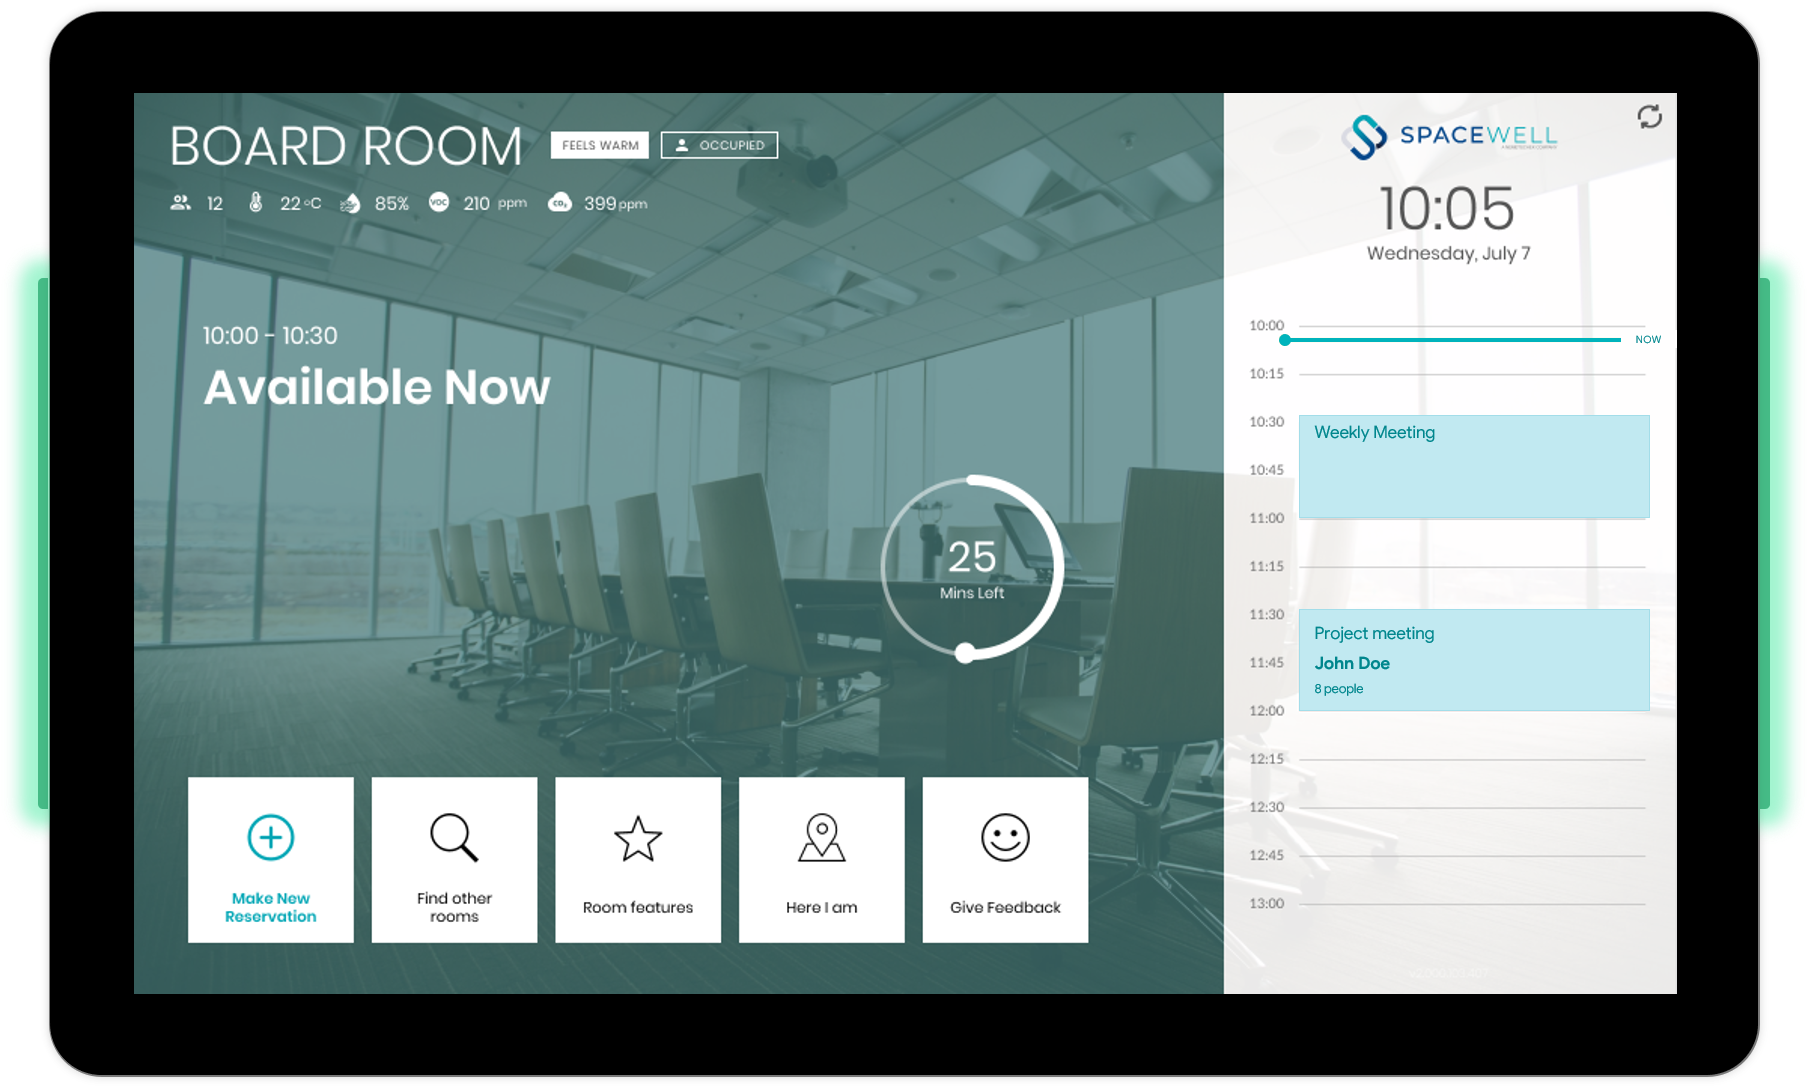 Meeting room display (Spacewell smart building platform)